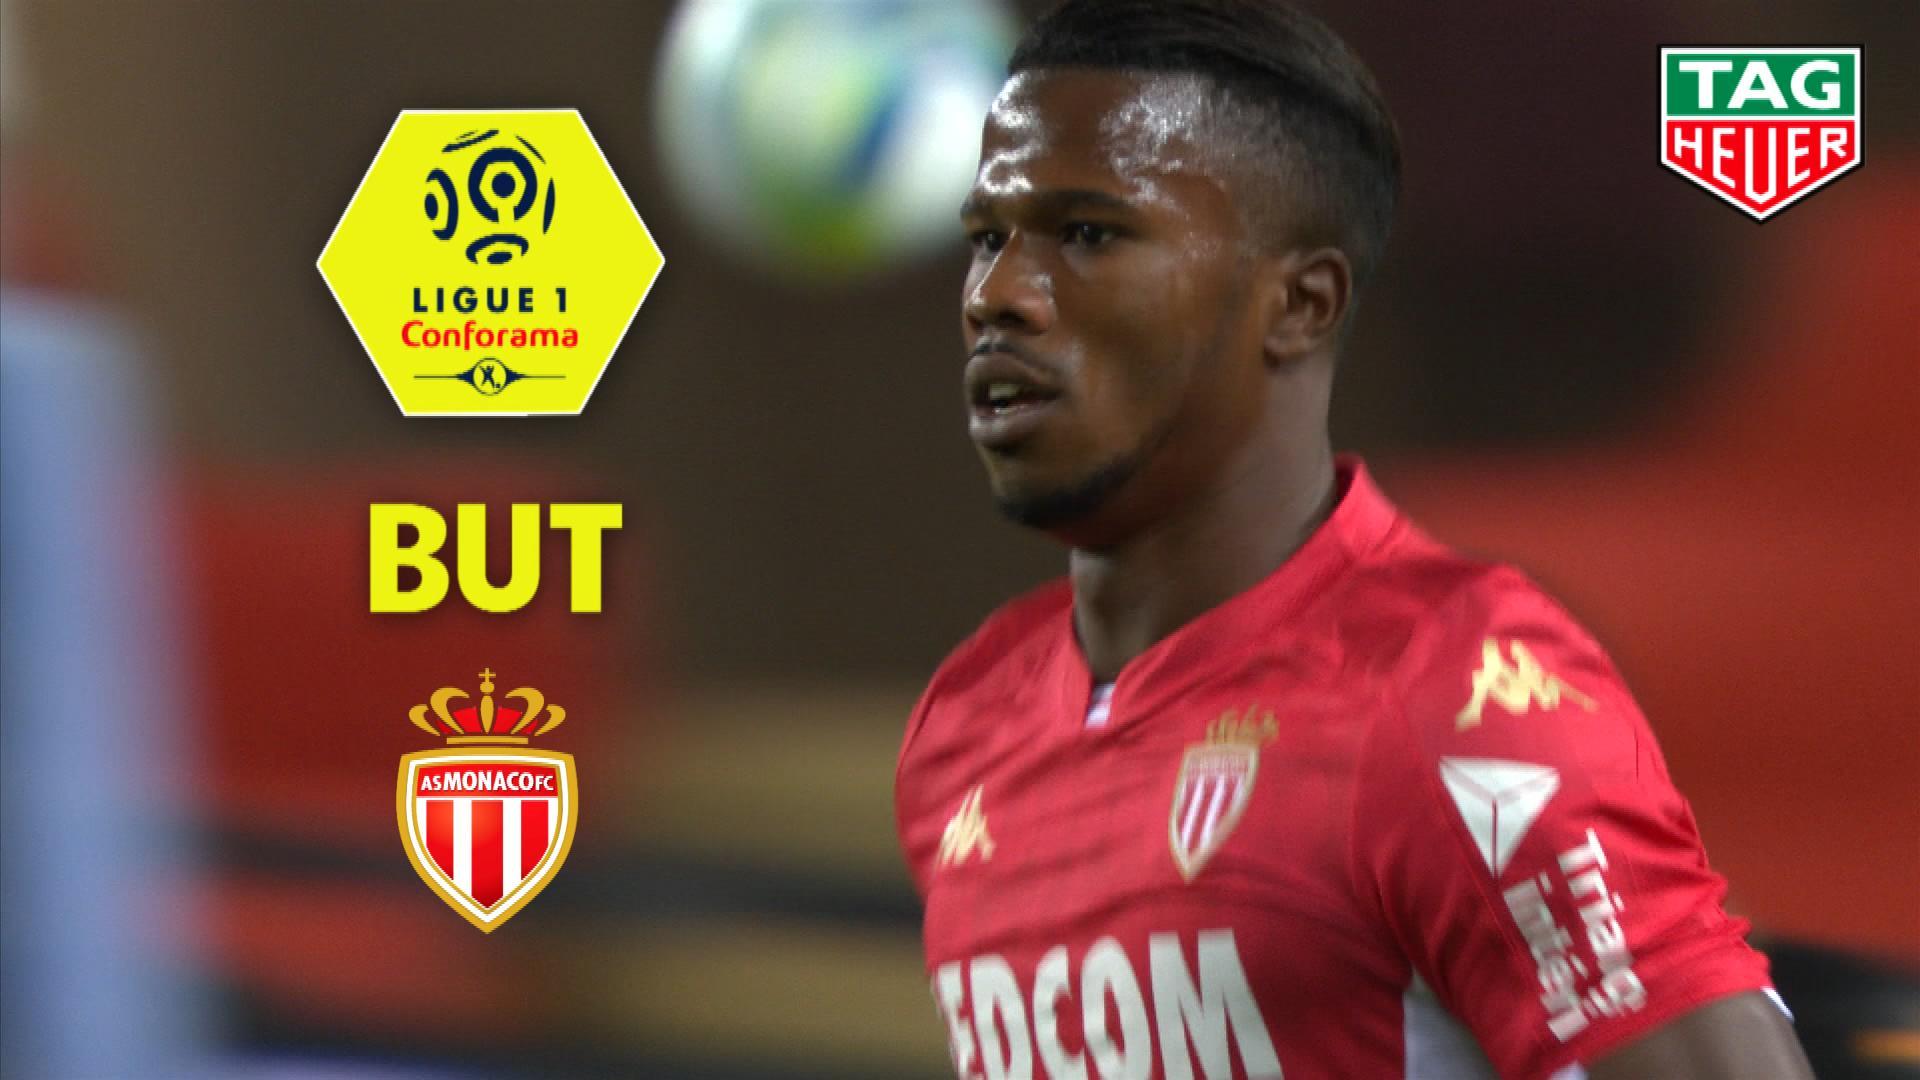 But Keita BALDE (75ème) / AS Monaco - Olympique de Marseille - (3-4) - (ASM-OM) / 2019-20